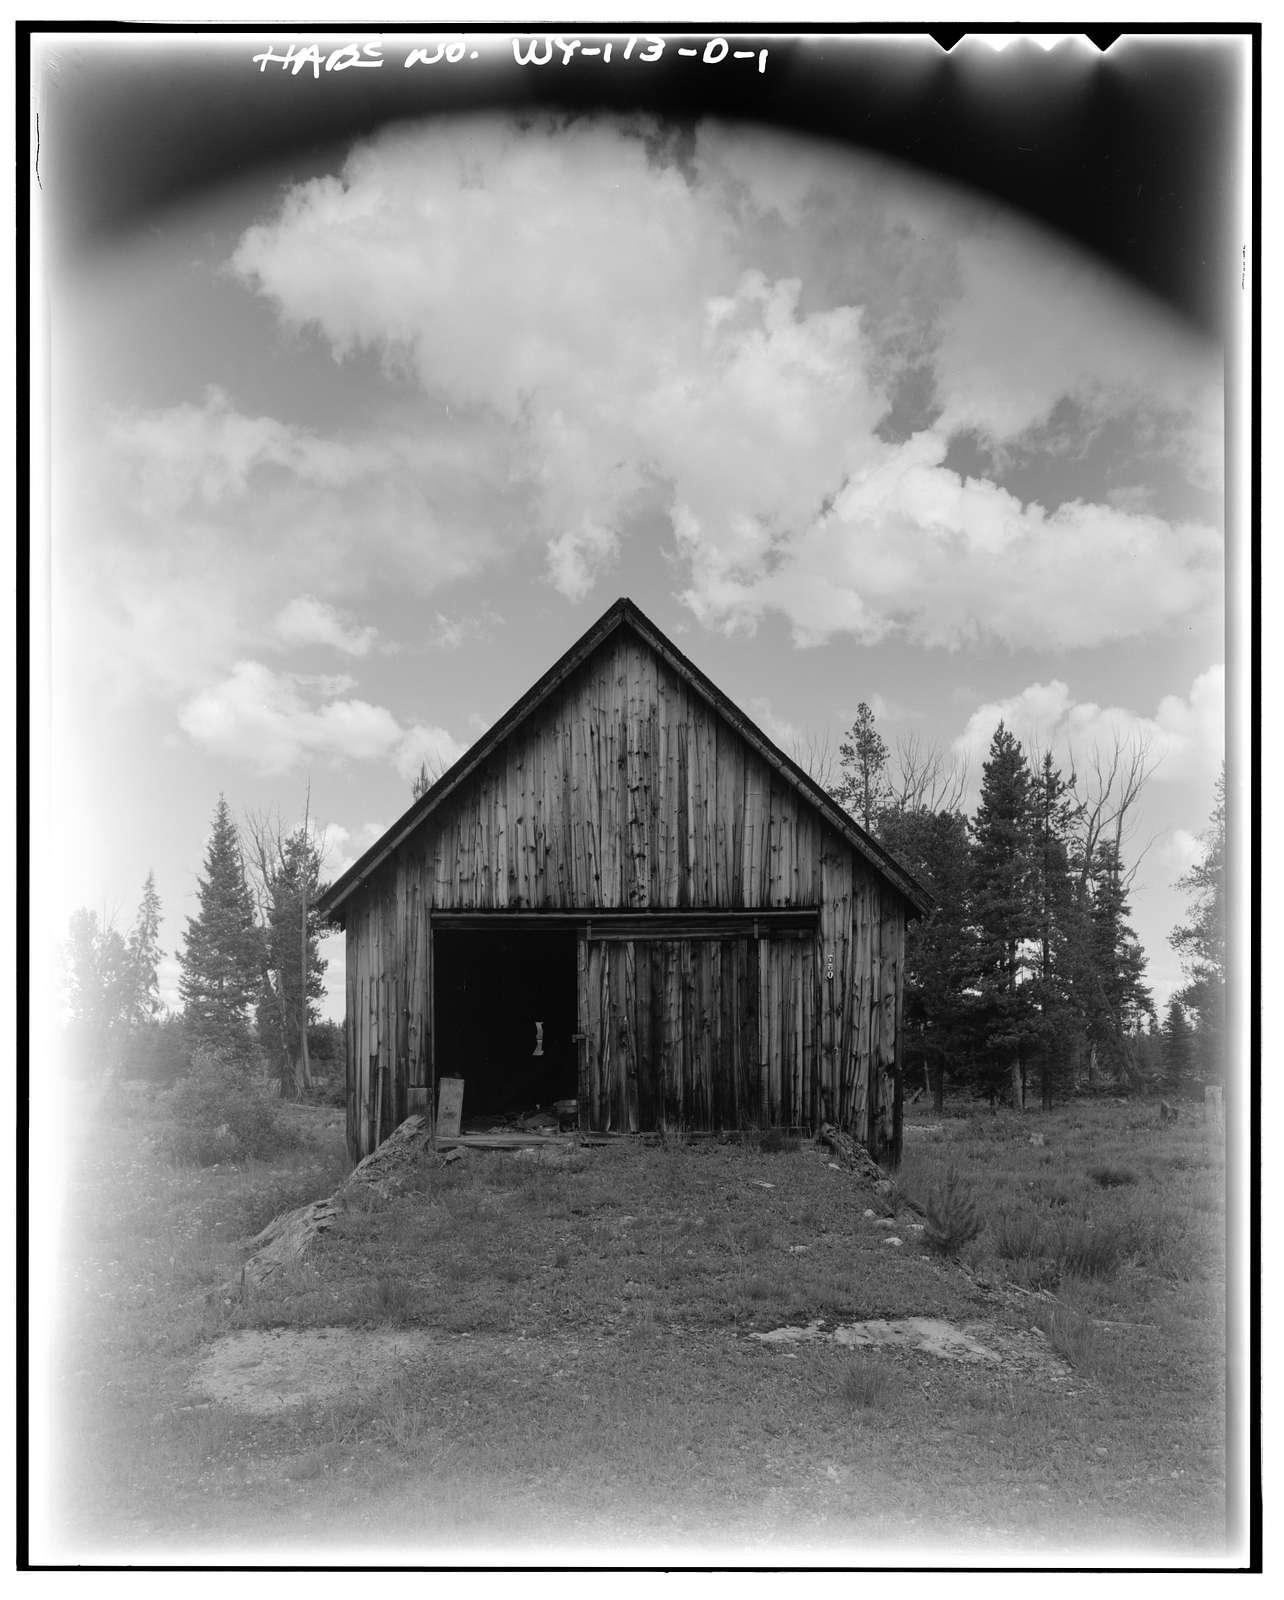 Geraldine Lucas Homestead, Garage, West bank Cottonwood Creek, 2.5 miles downstream from Jenny Lake, Moose, Teton County, WY